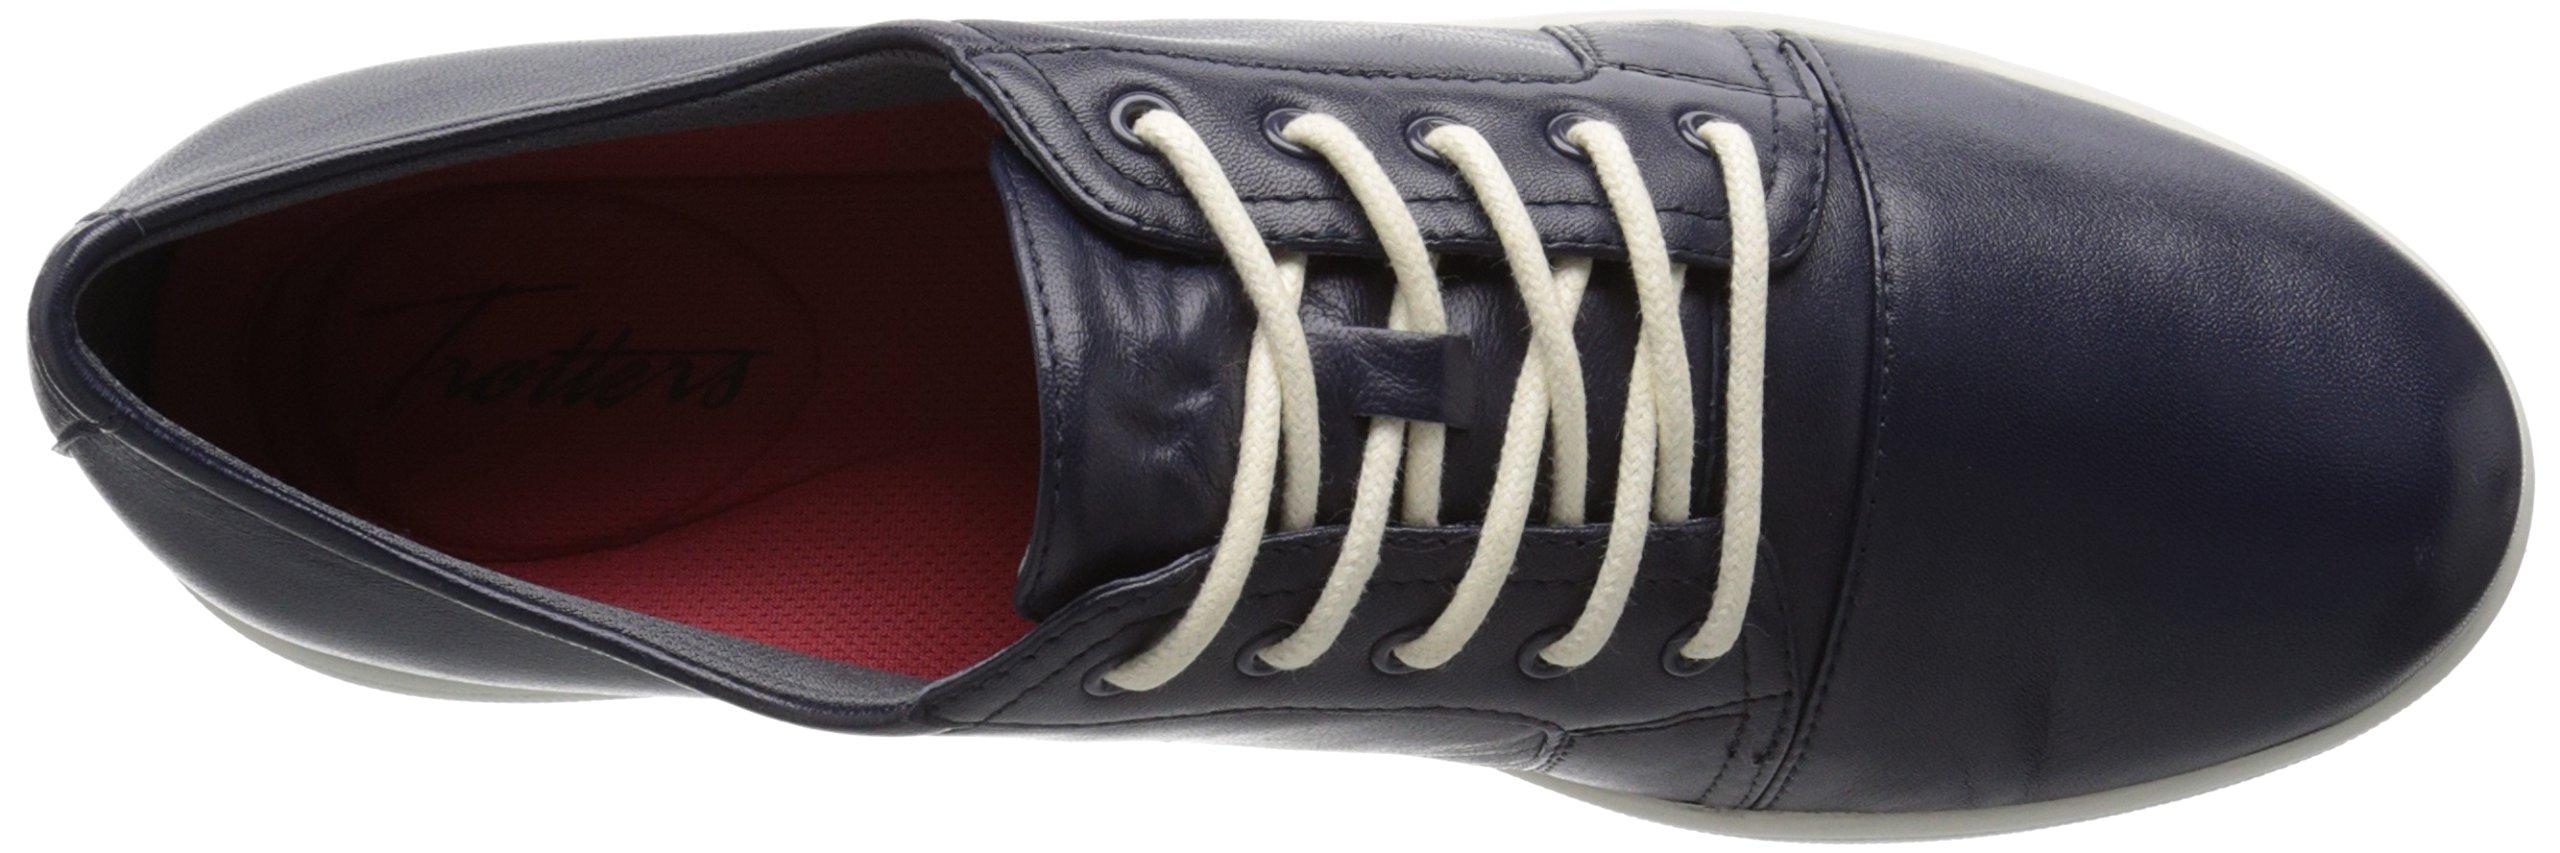 Trotters Women's Arizona Sneaker, Navy, 9 M US by Trotters (Image #8)